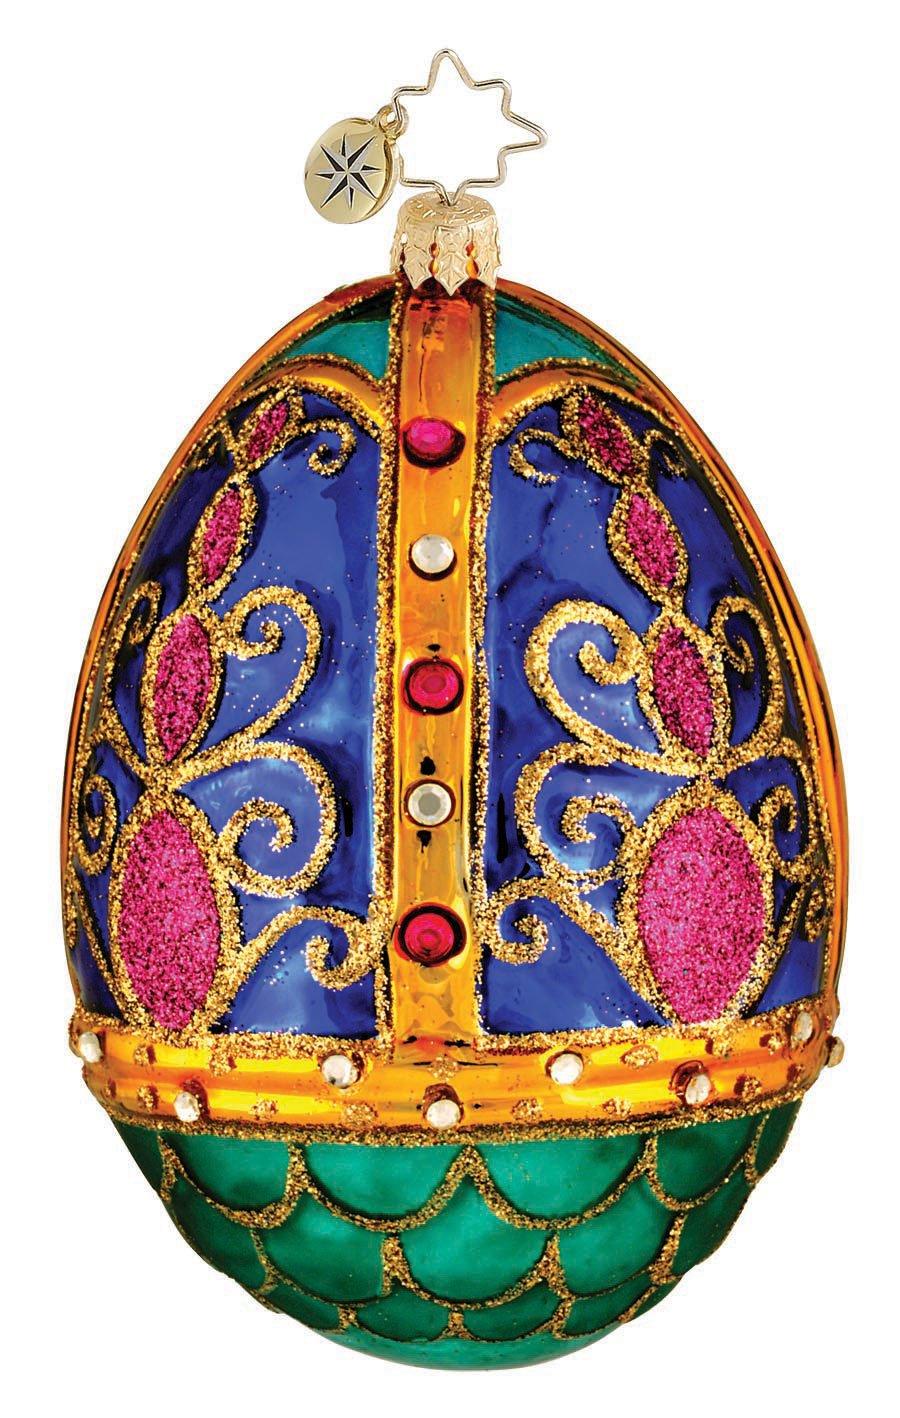 Faberge Inspired Egg Blue Easter Glass Ornament